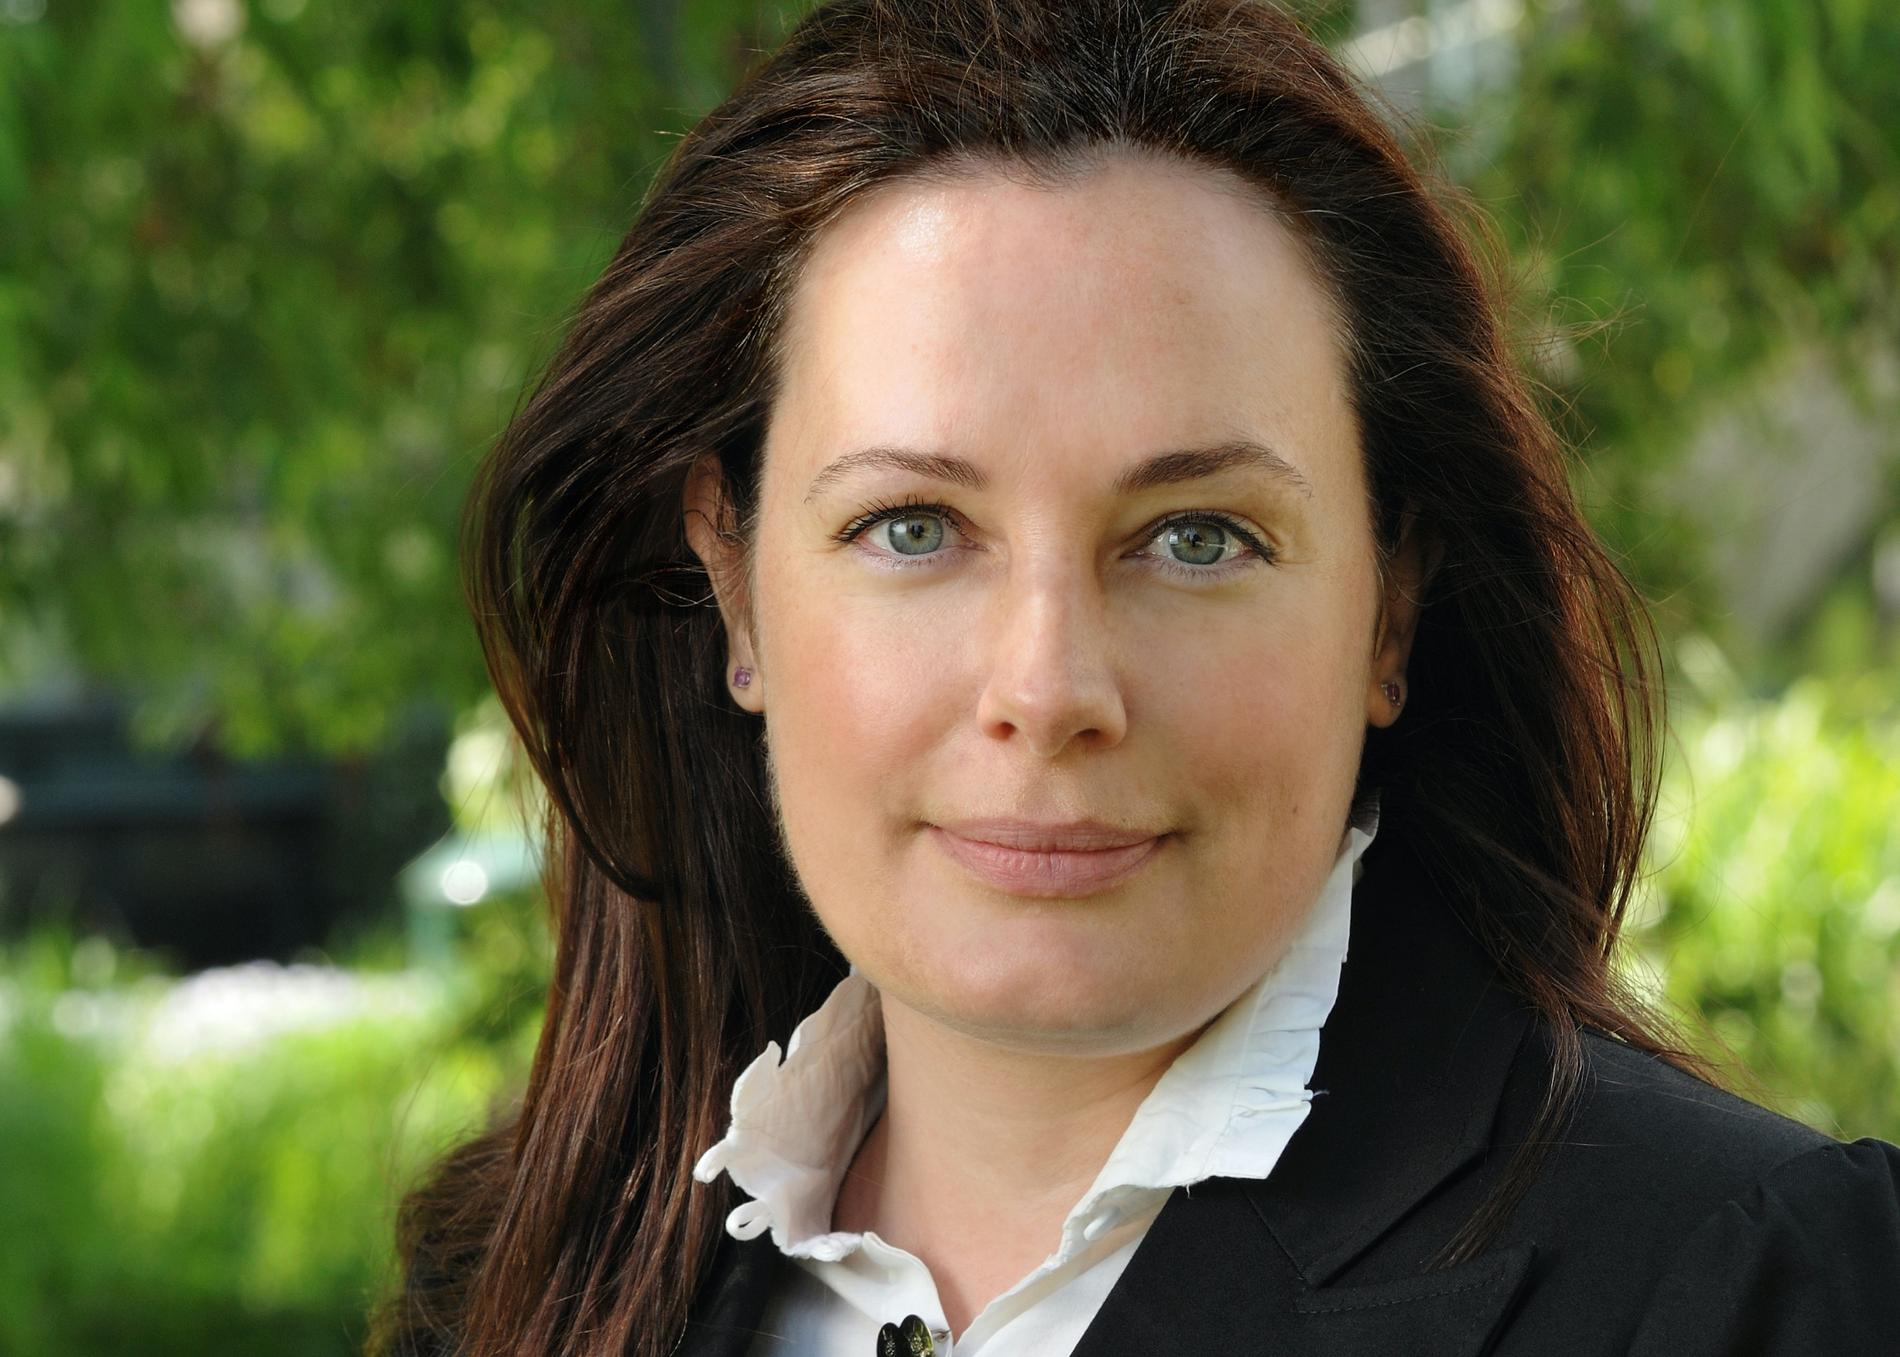 Marie Bexelius tror att flygbolagen medvetet undanhåller information.